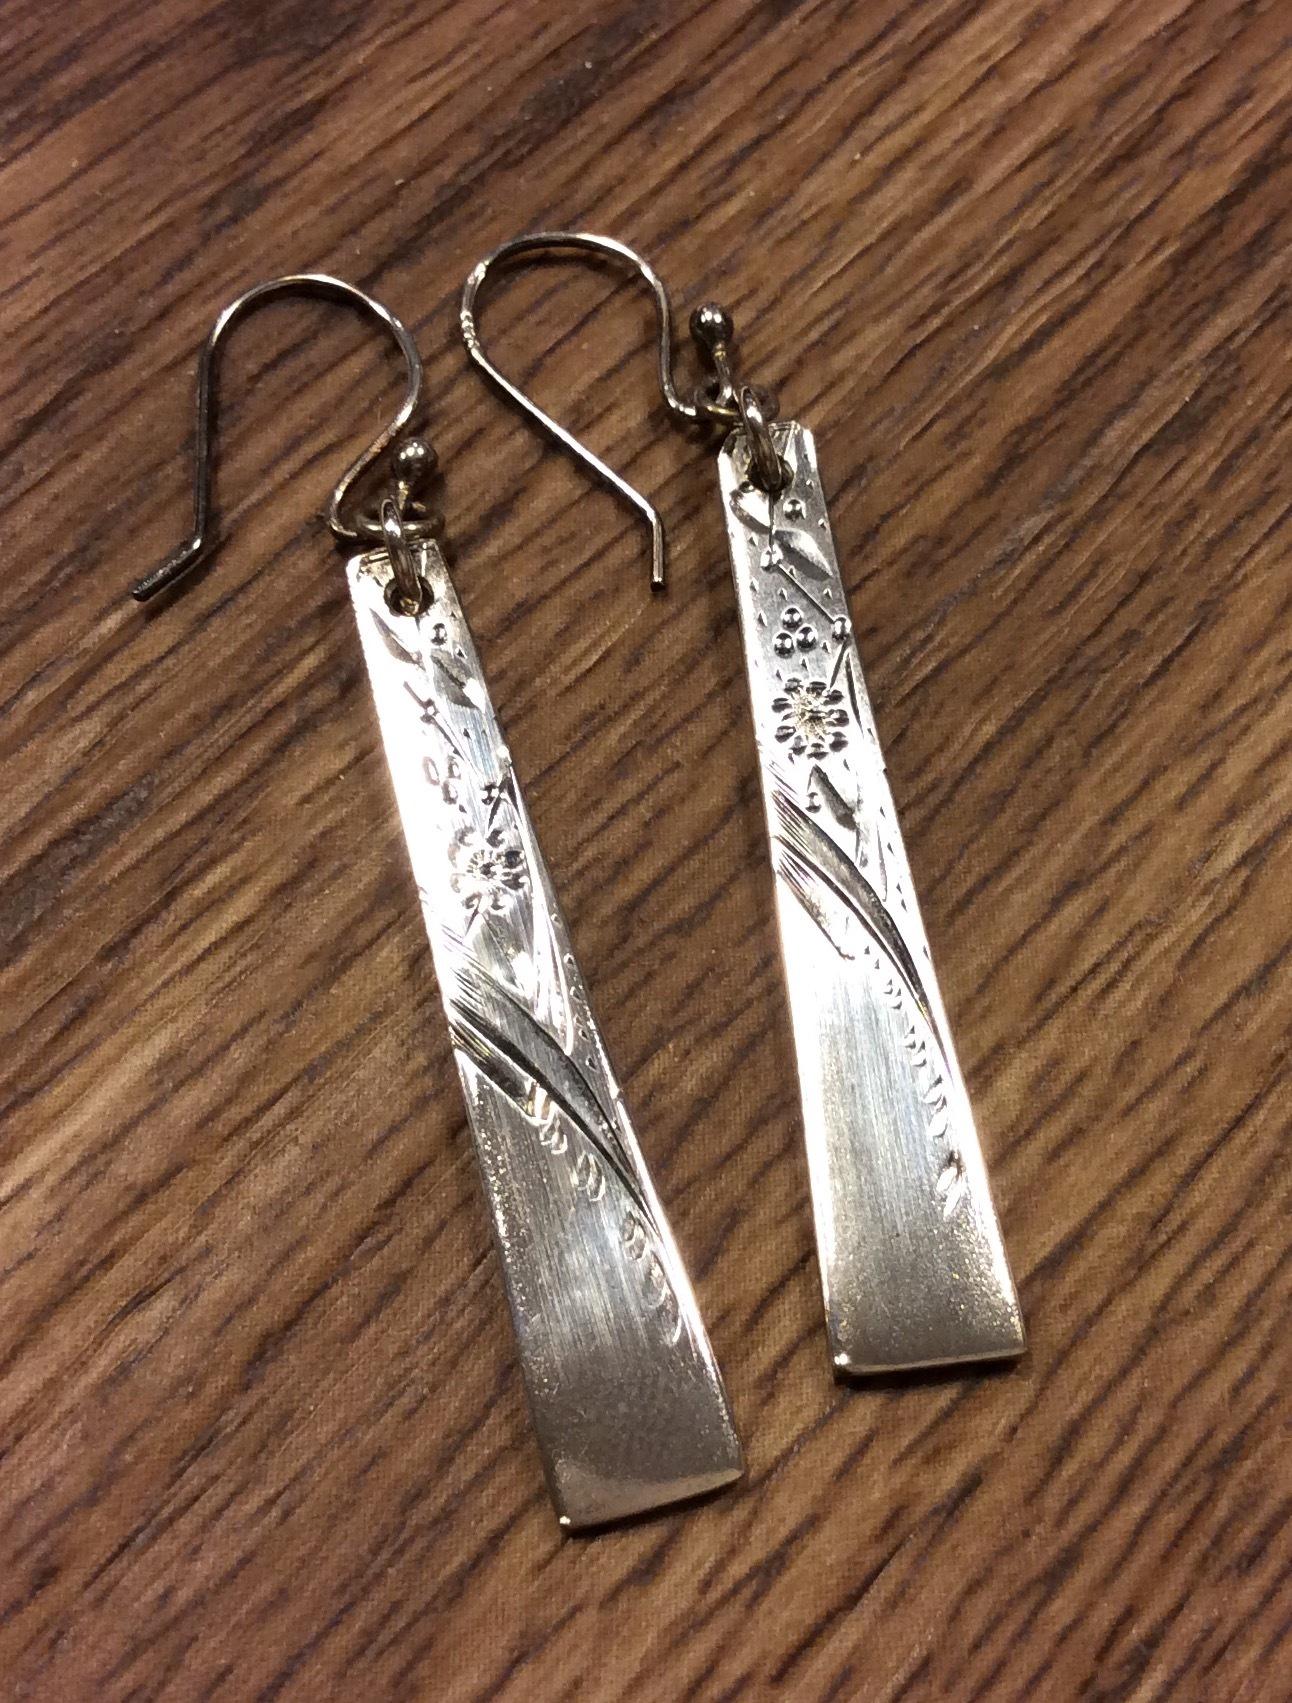 Floral engraved sterling silver earrings